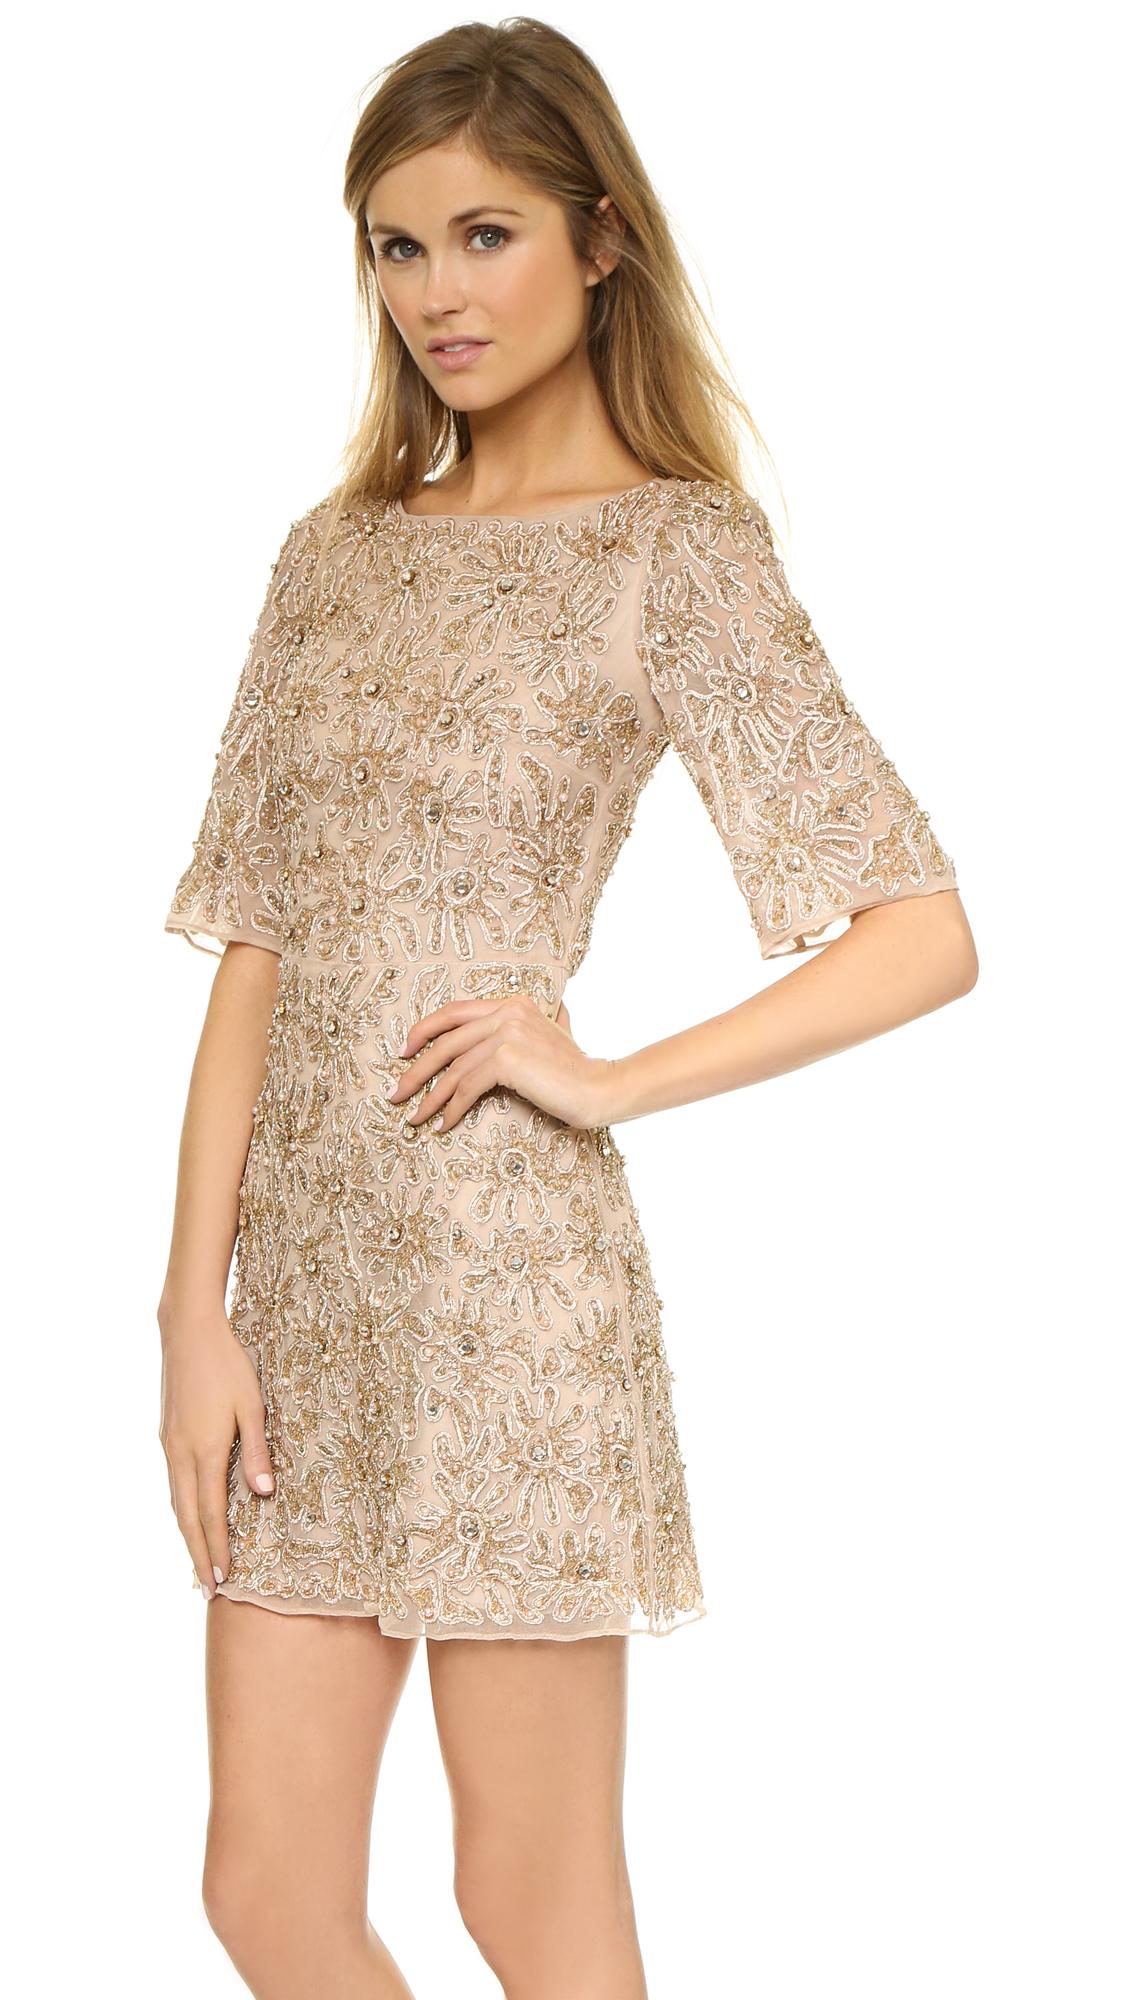 4e6b271816 Alice + Olivia Drina Embellished Dress - Nude/Rose Gold in Natural ...